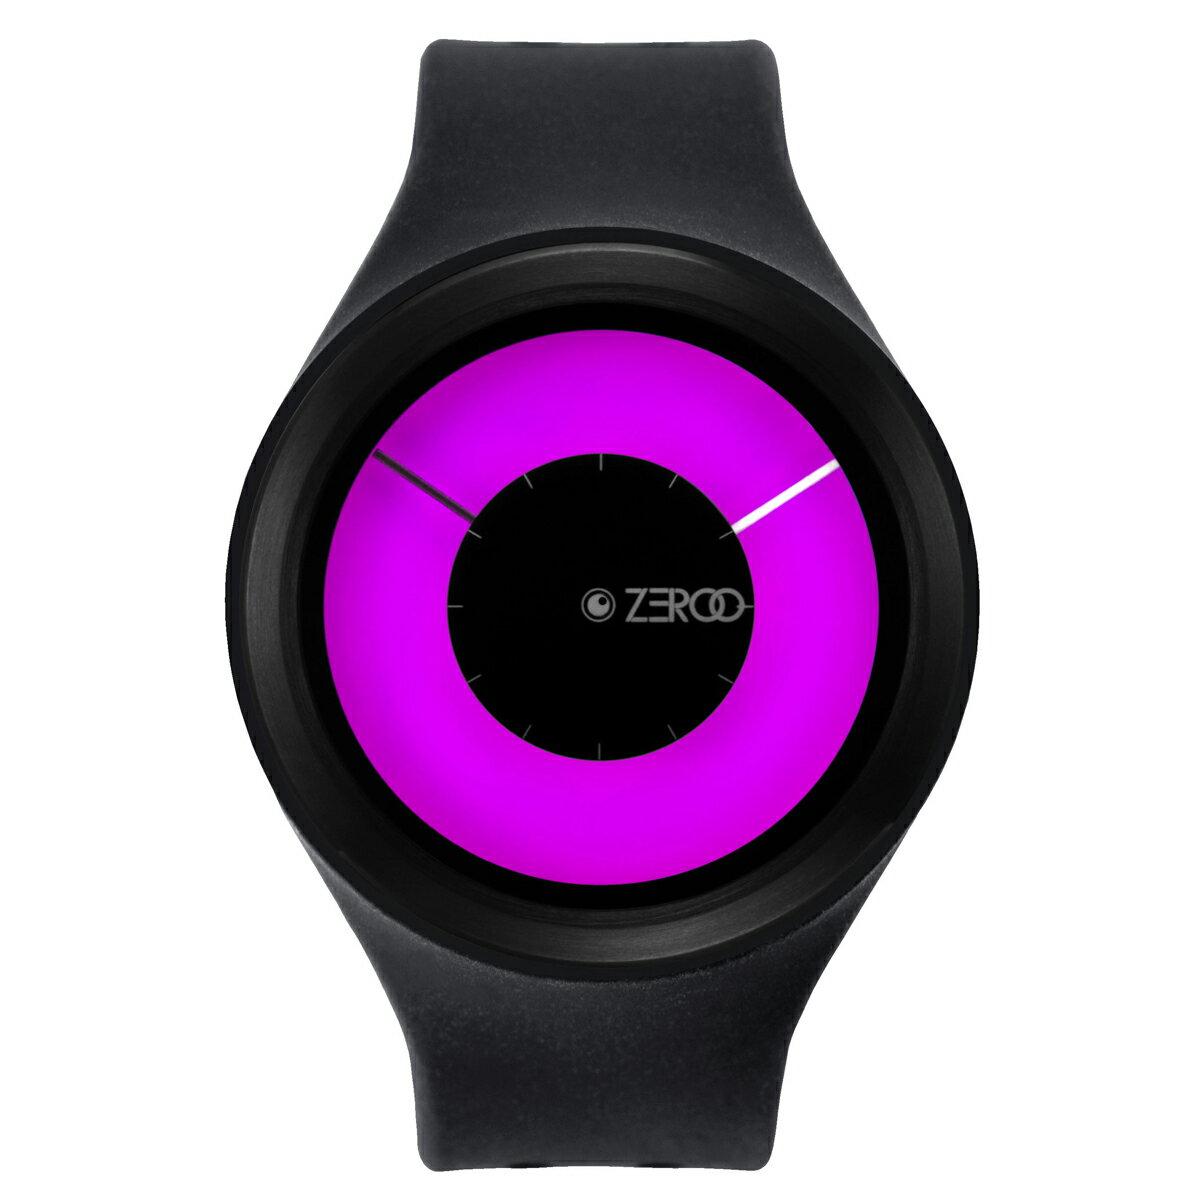 ZEROO MAGIA AURORA ゼロ 電池式クォーツ 腕時計 [W00801B03SR02] ブラック デザインウォッチ ペア用 メンズ レディース ユニセックス おしゃれ時計 デザイナーズ